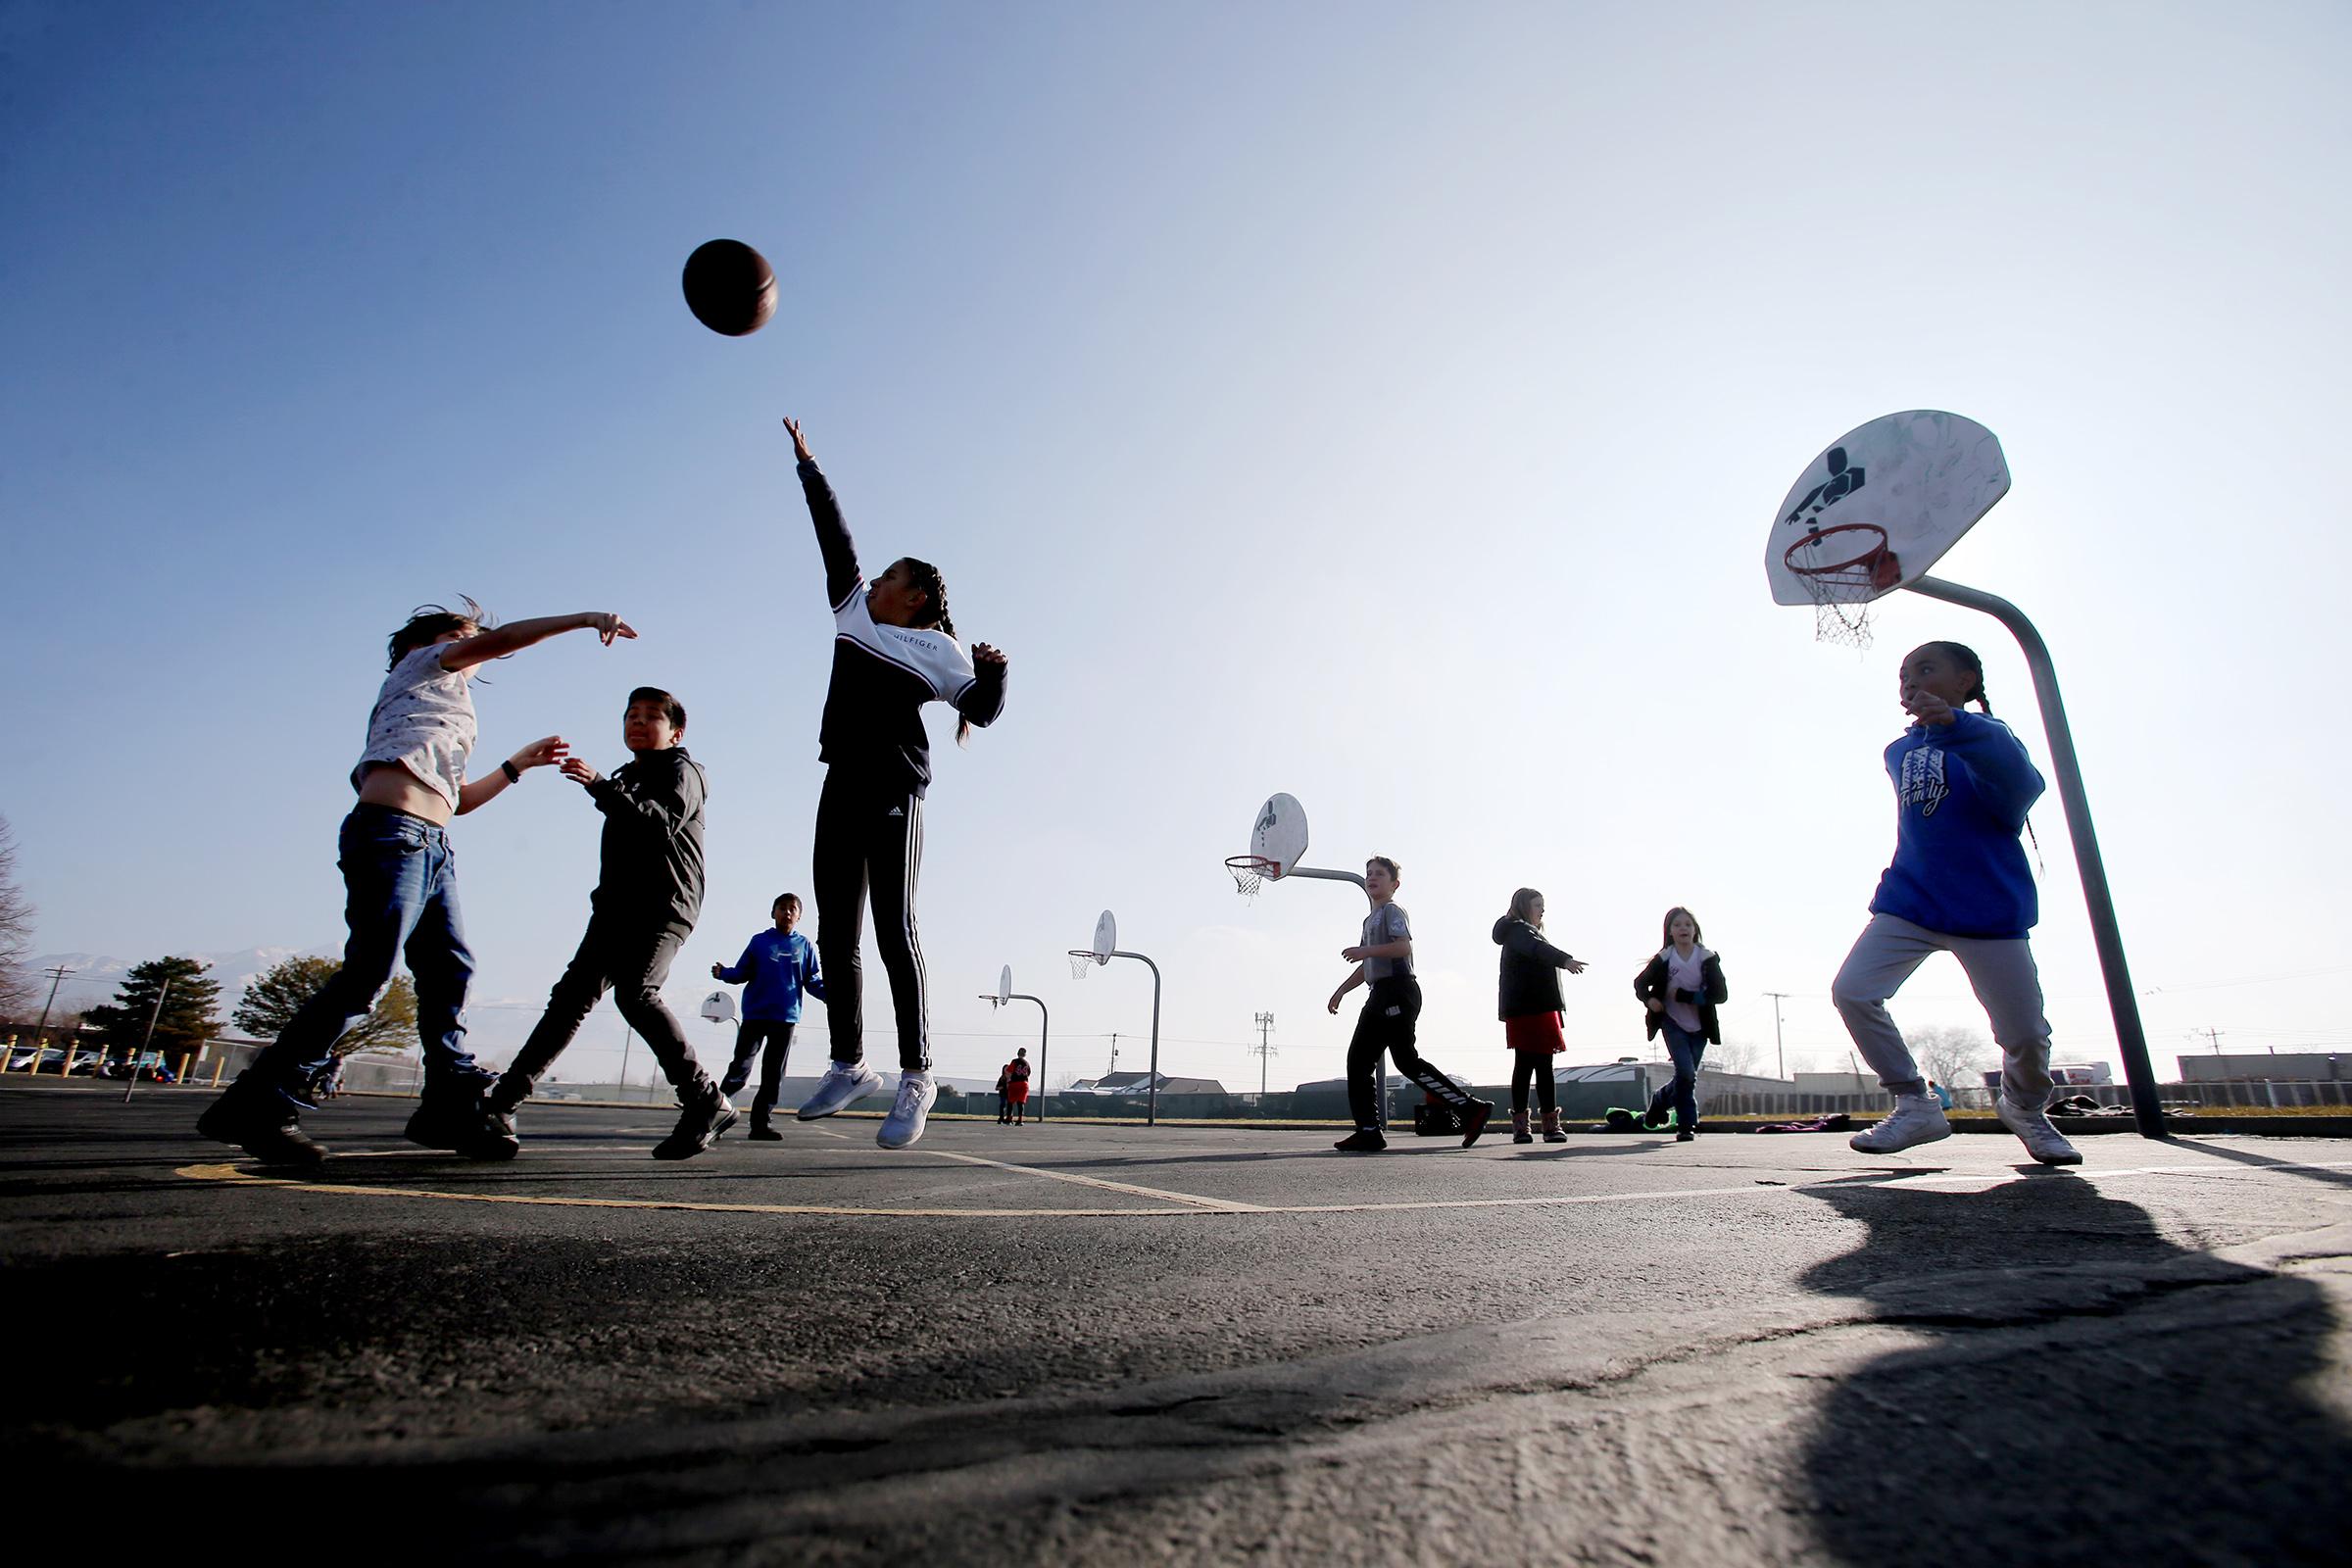 Students at Terra Linda Elementary School in West Jordan play basketball during recess on Friday, Dec. 6, 2019.